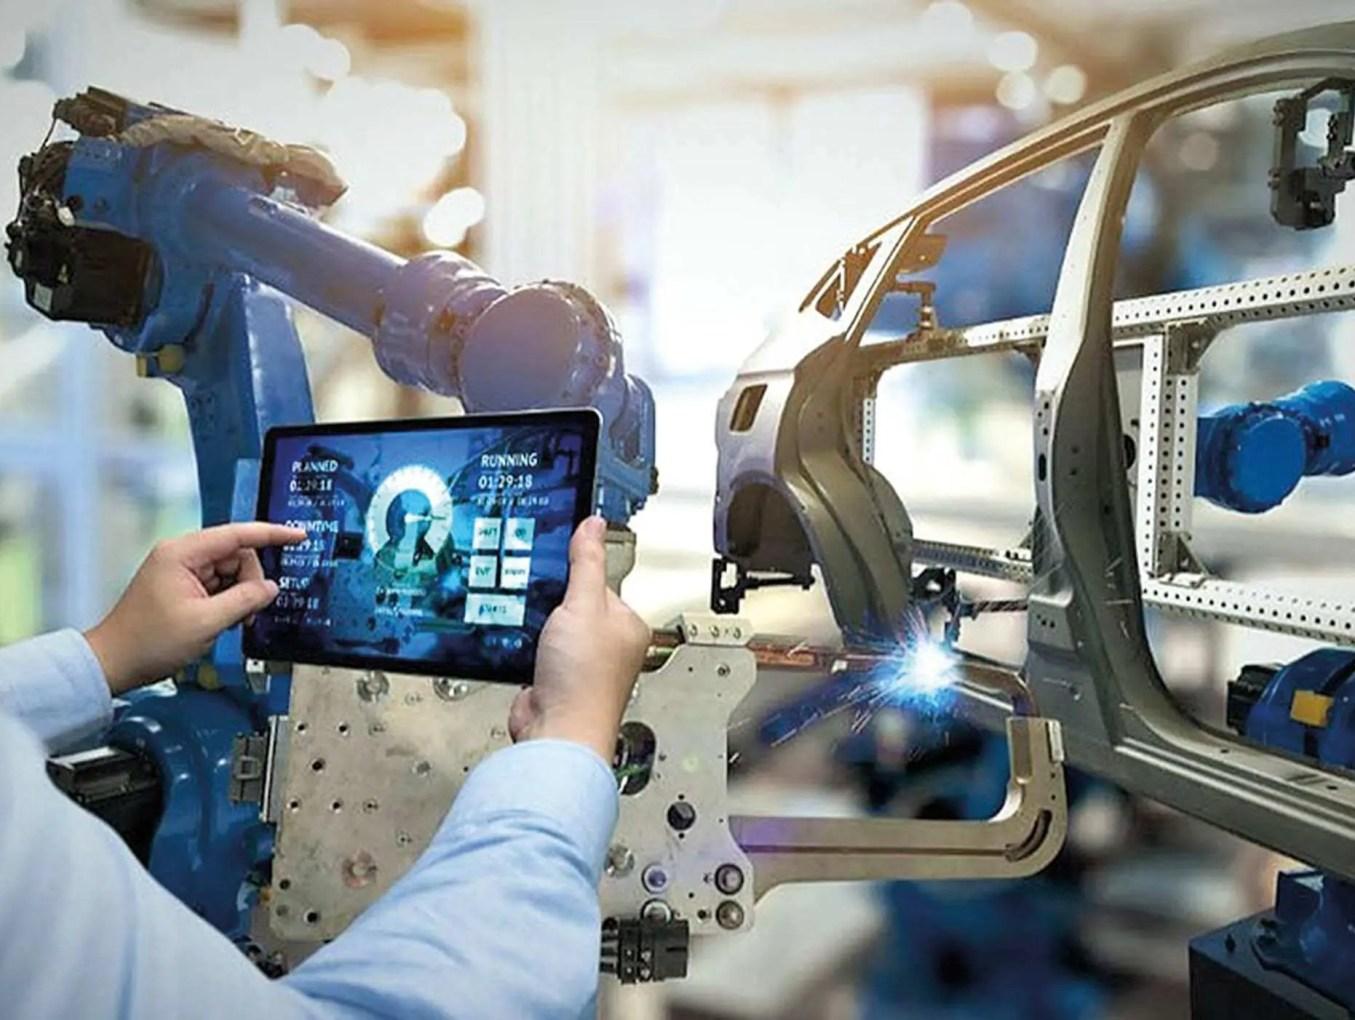 Realidade Virtual e Realidade Aumentada: entenda as principais diferenças